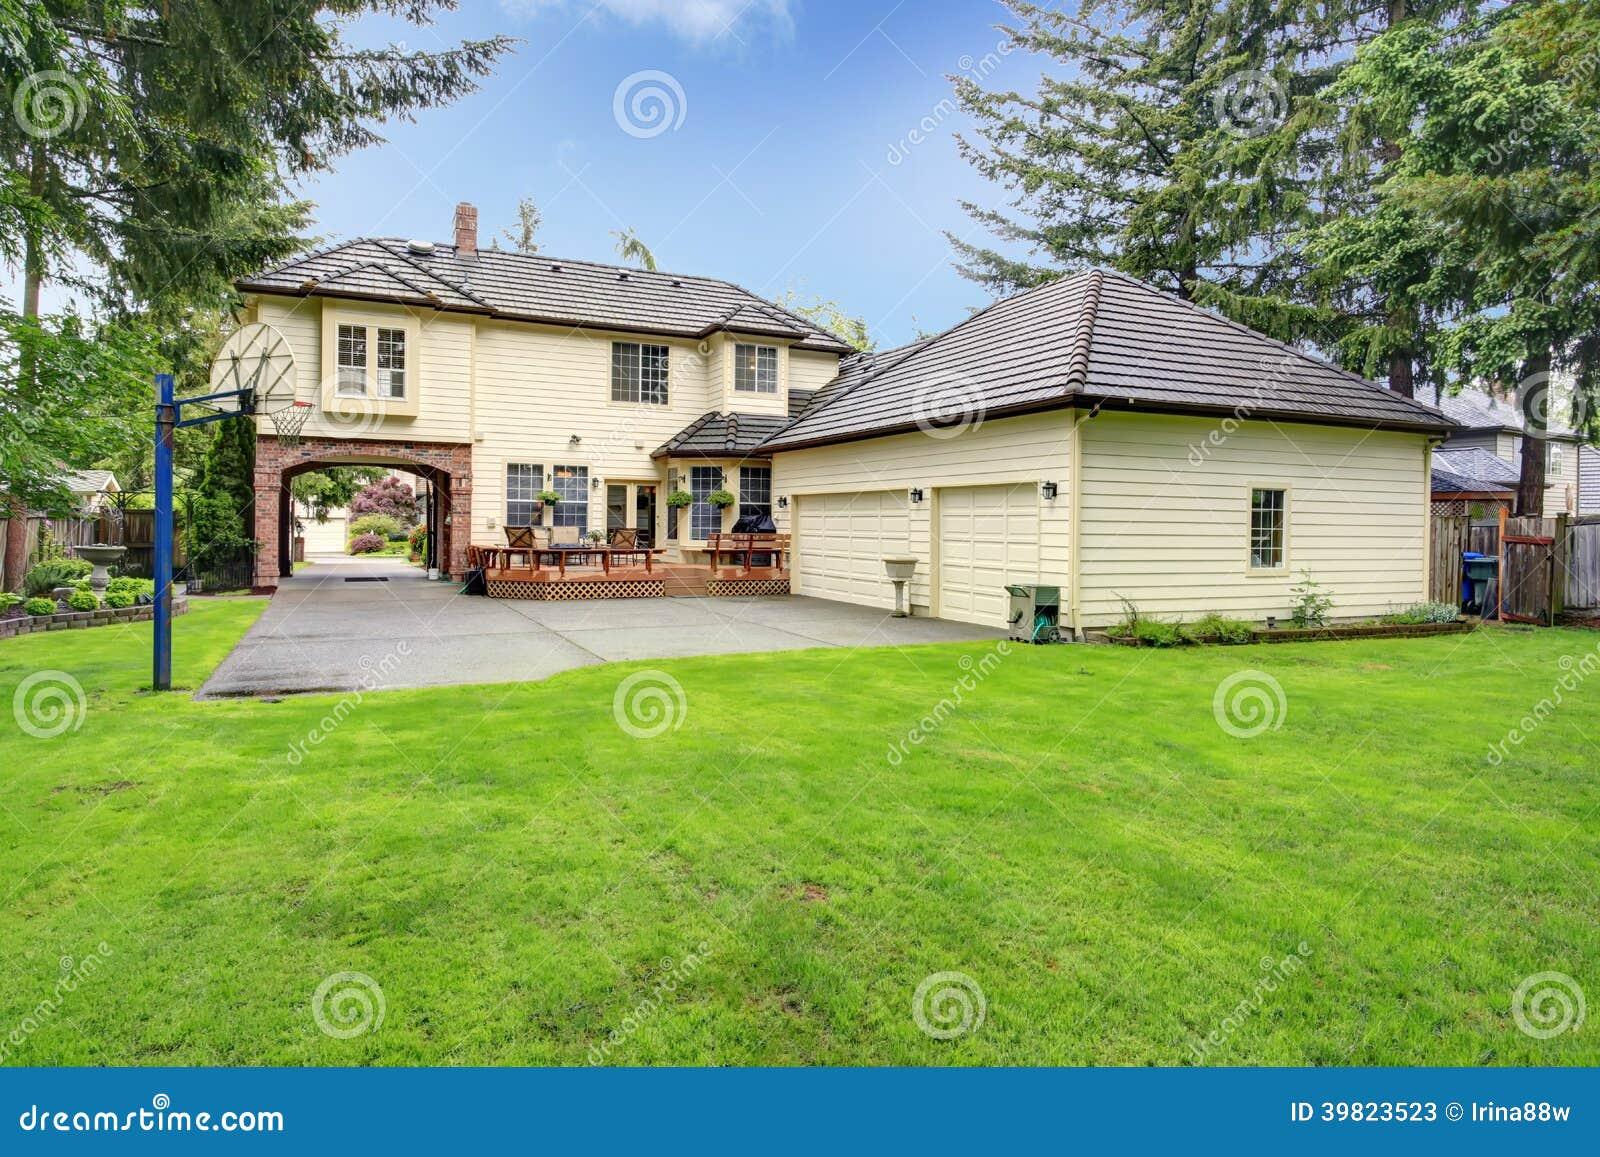 complete teardown and rebuild new house porte cochere style